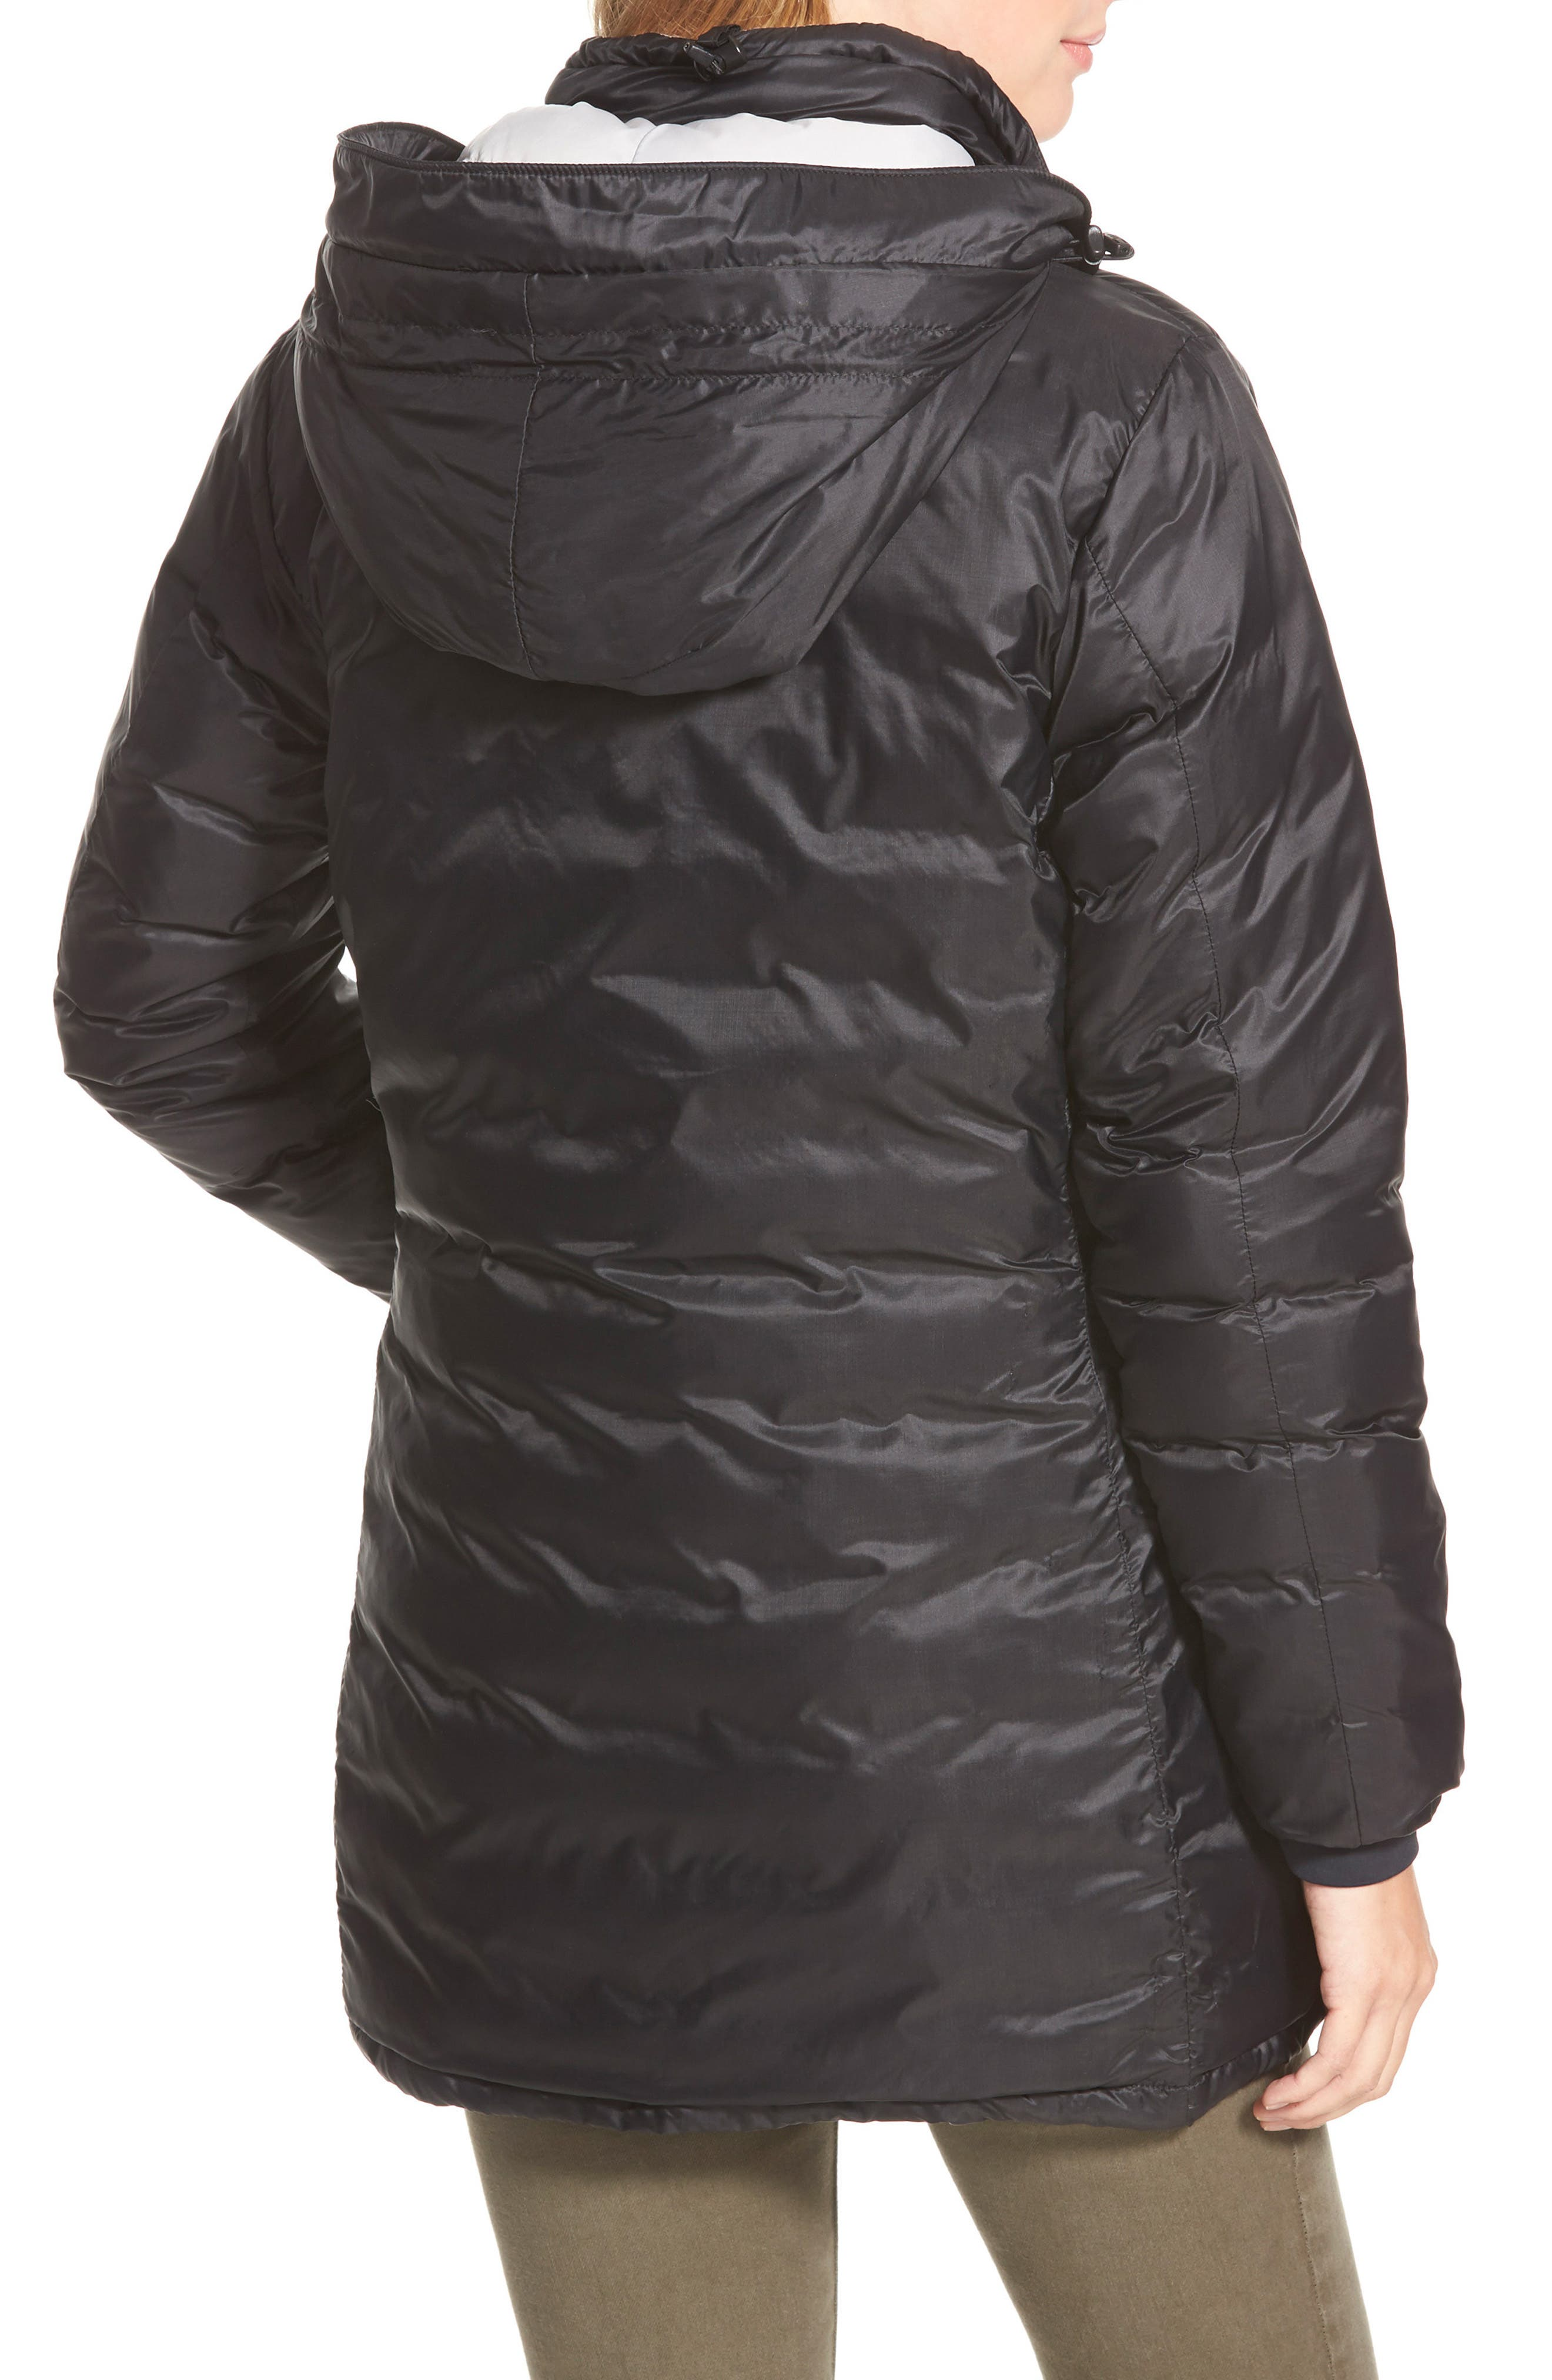 'Camp' Slim Fit Hooded Packable Down Jacket,                             Alternate thumbnail 2, color,                             Black